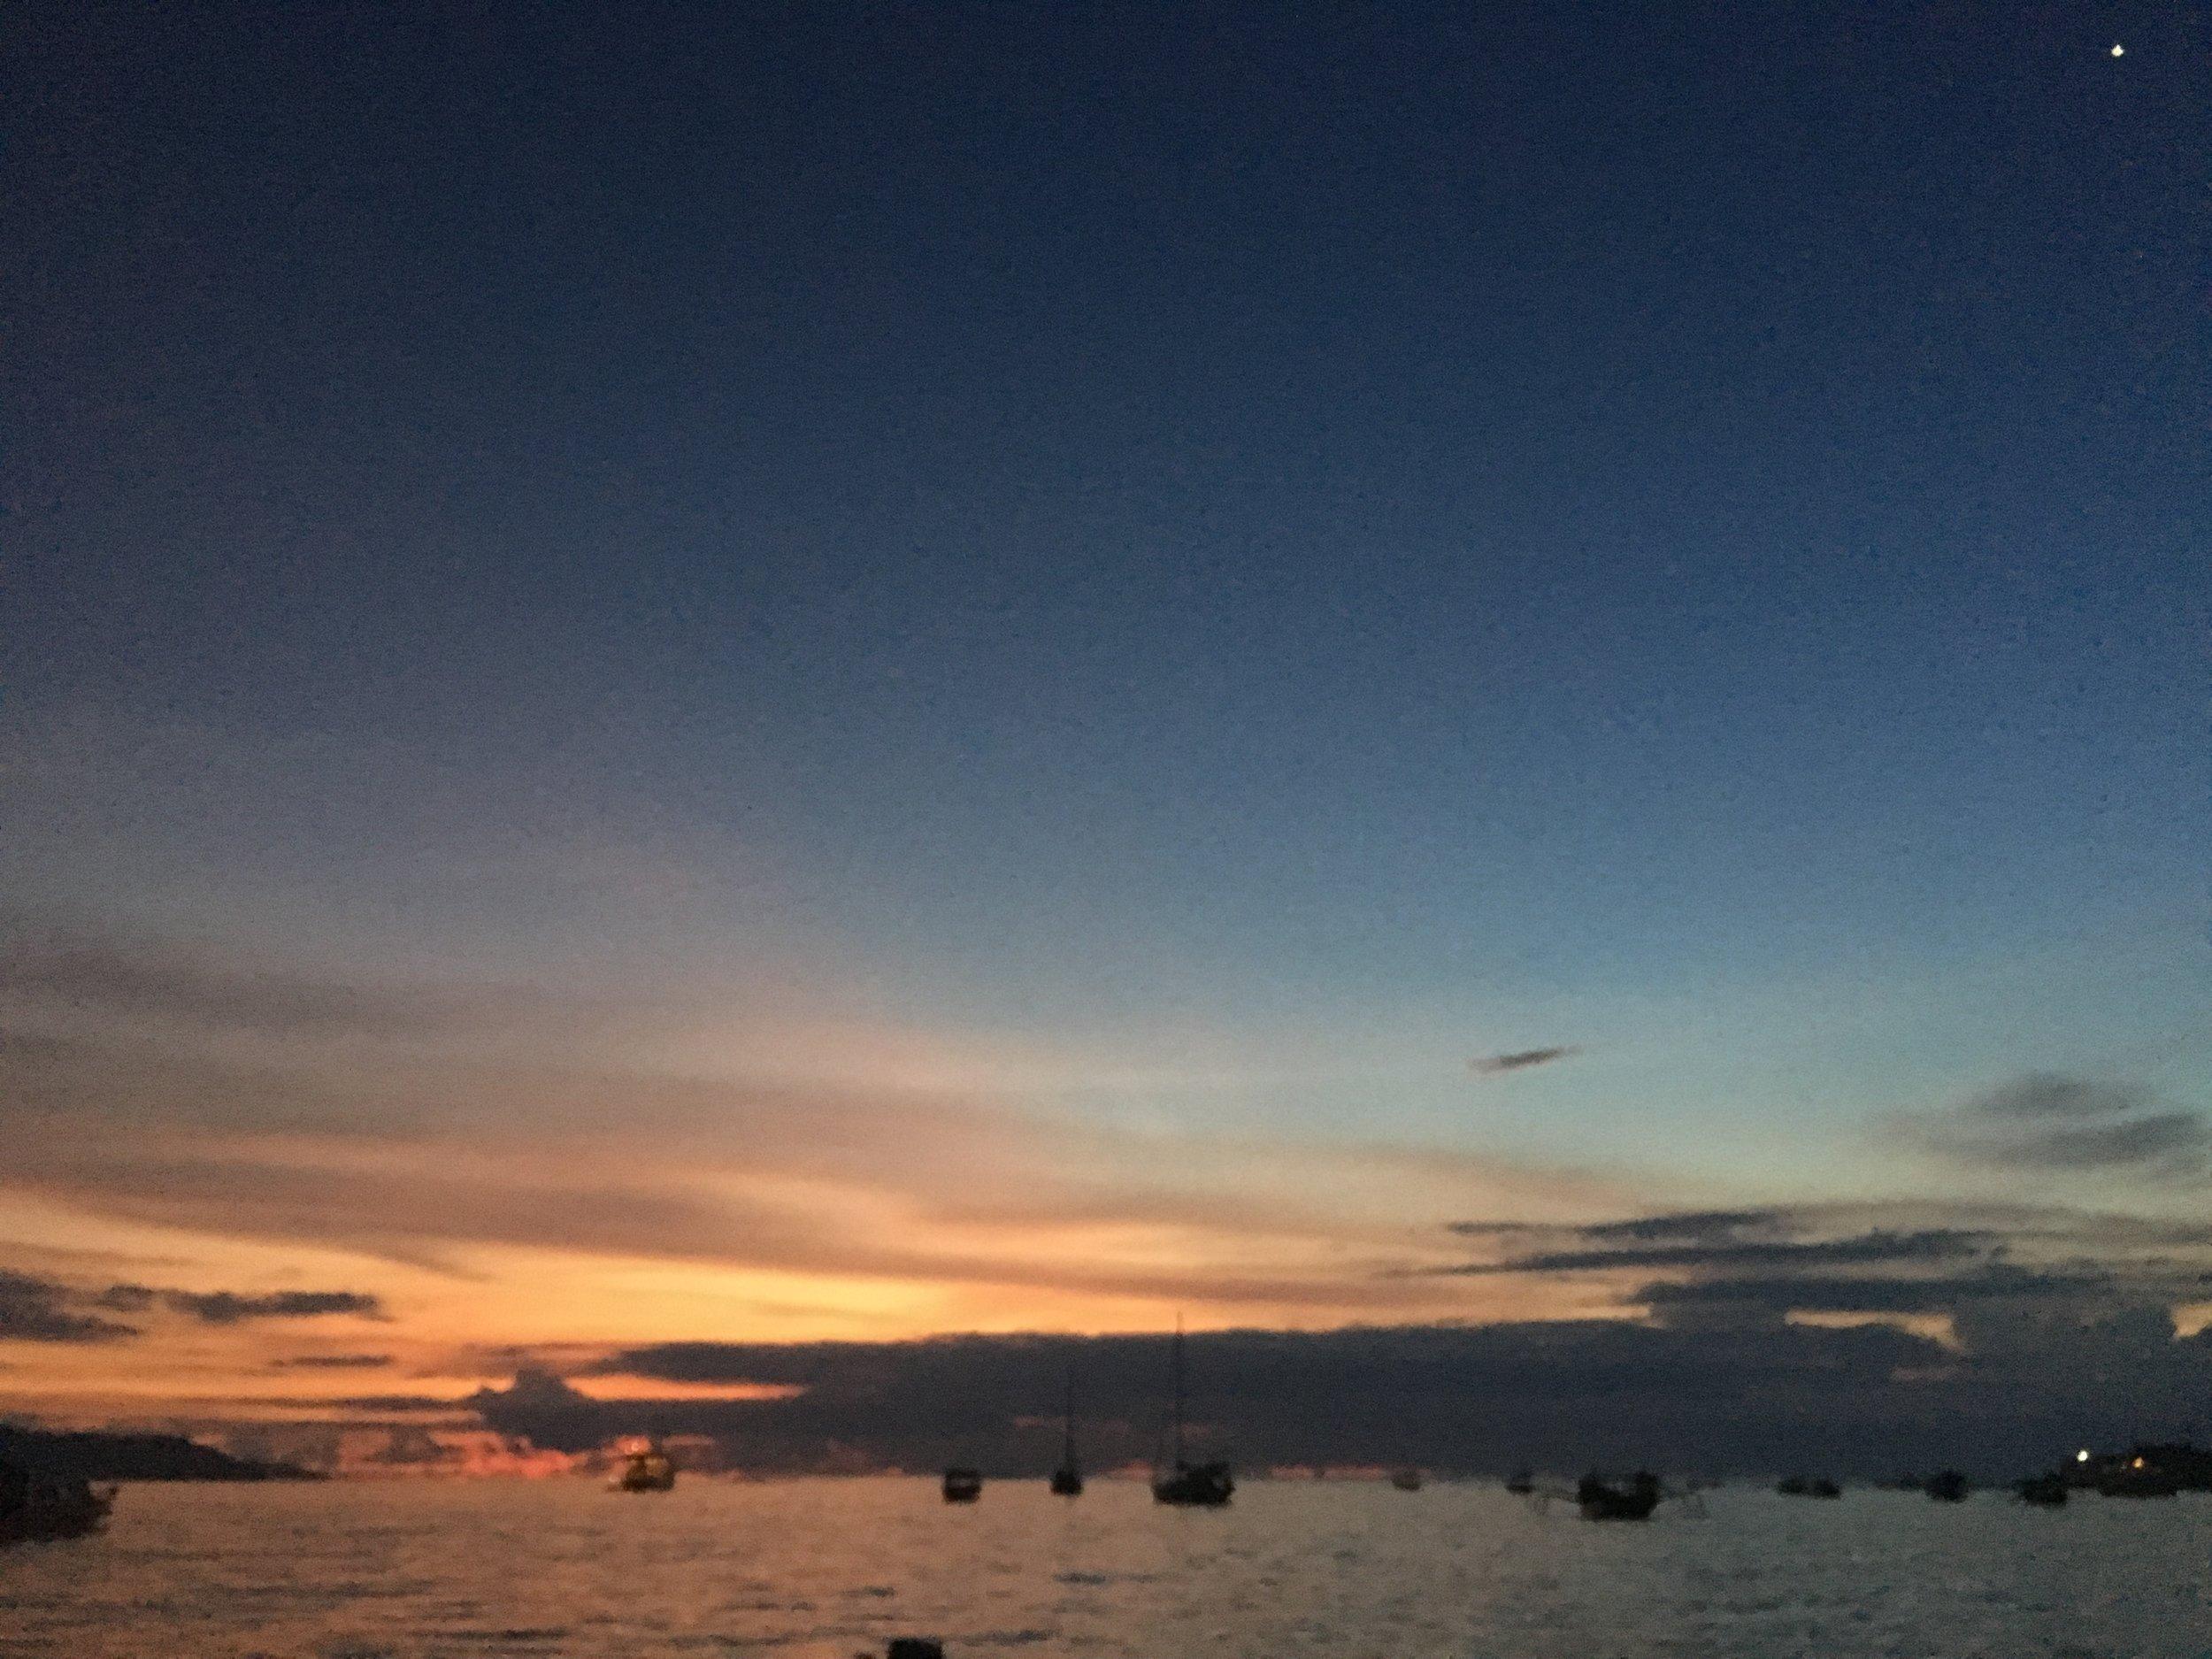 Sunset on Gili Air, Lombok